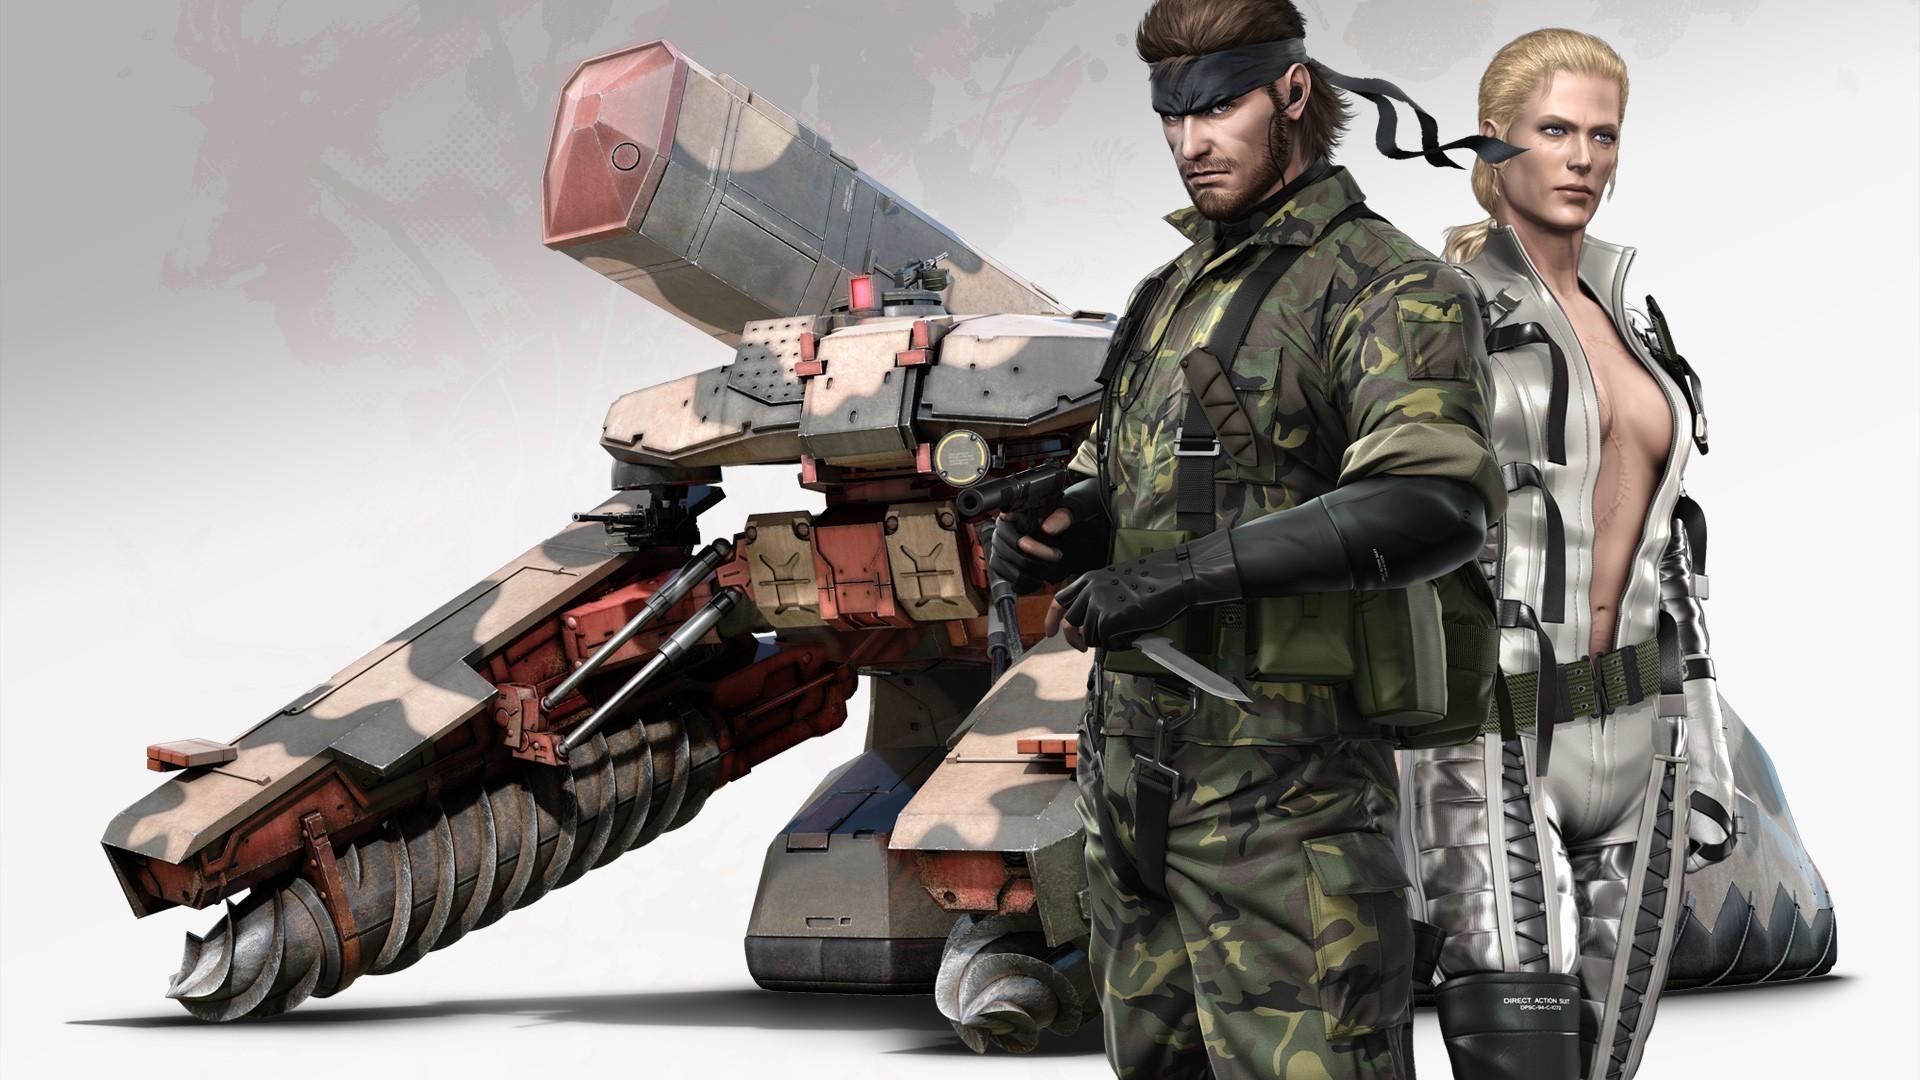 Metal Gear Solid, Big Boss, Metal Gear Solid 3: Snake